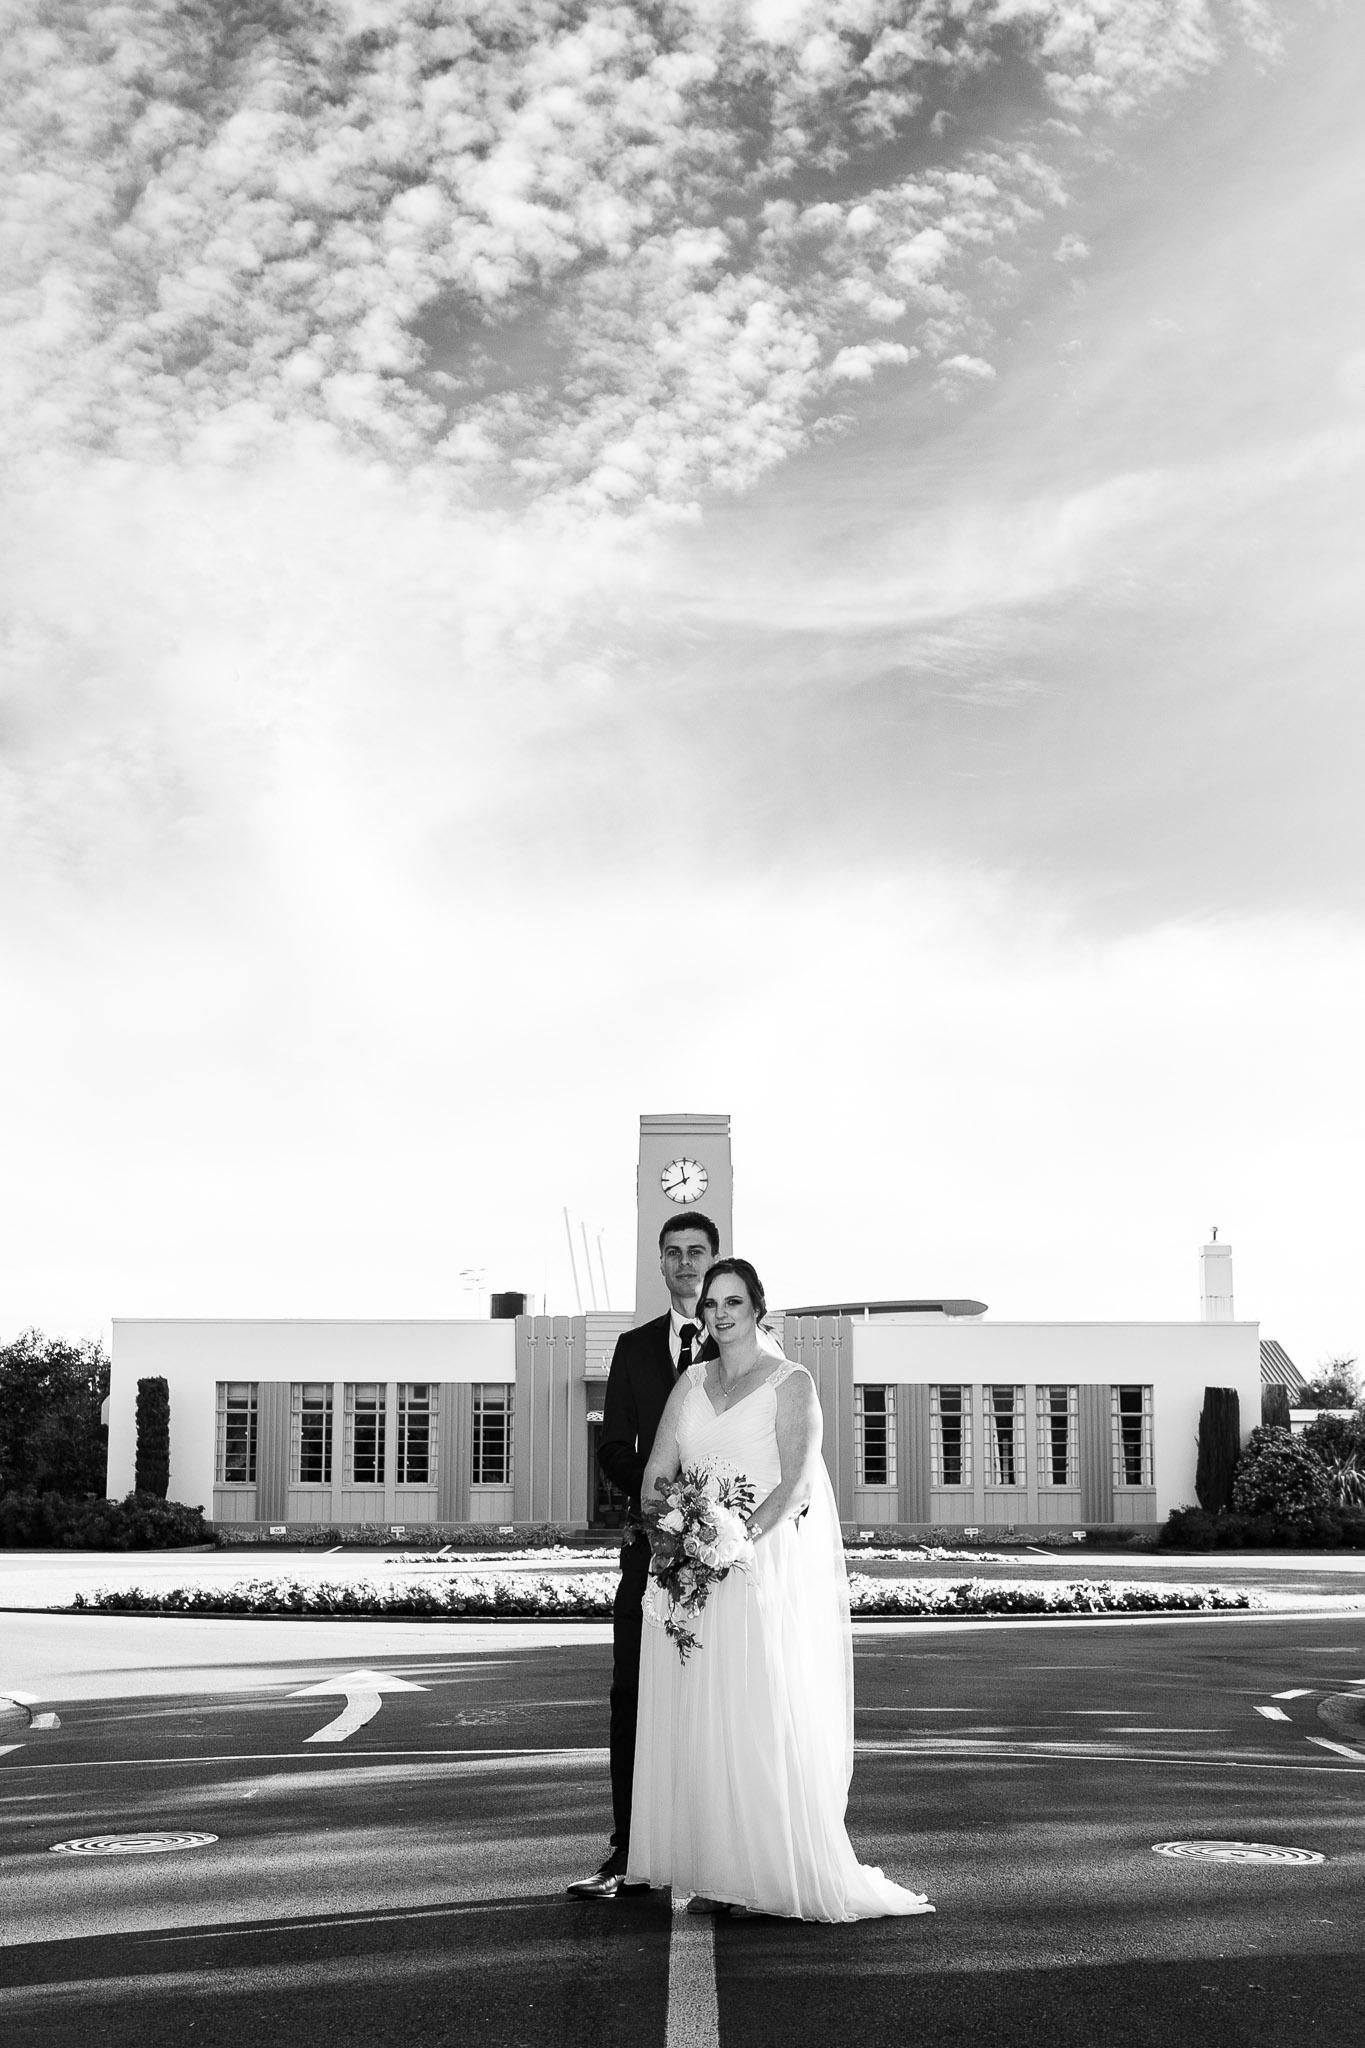 highlight_wedding_photography_manawatu_palmerston_north_new_zealand_rangitikei_golf_ohakea-39.jpg